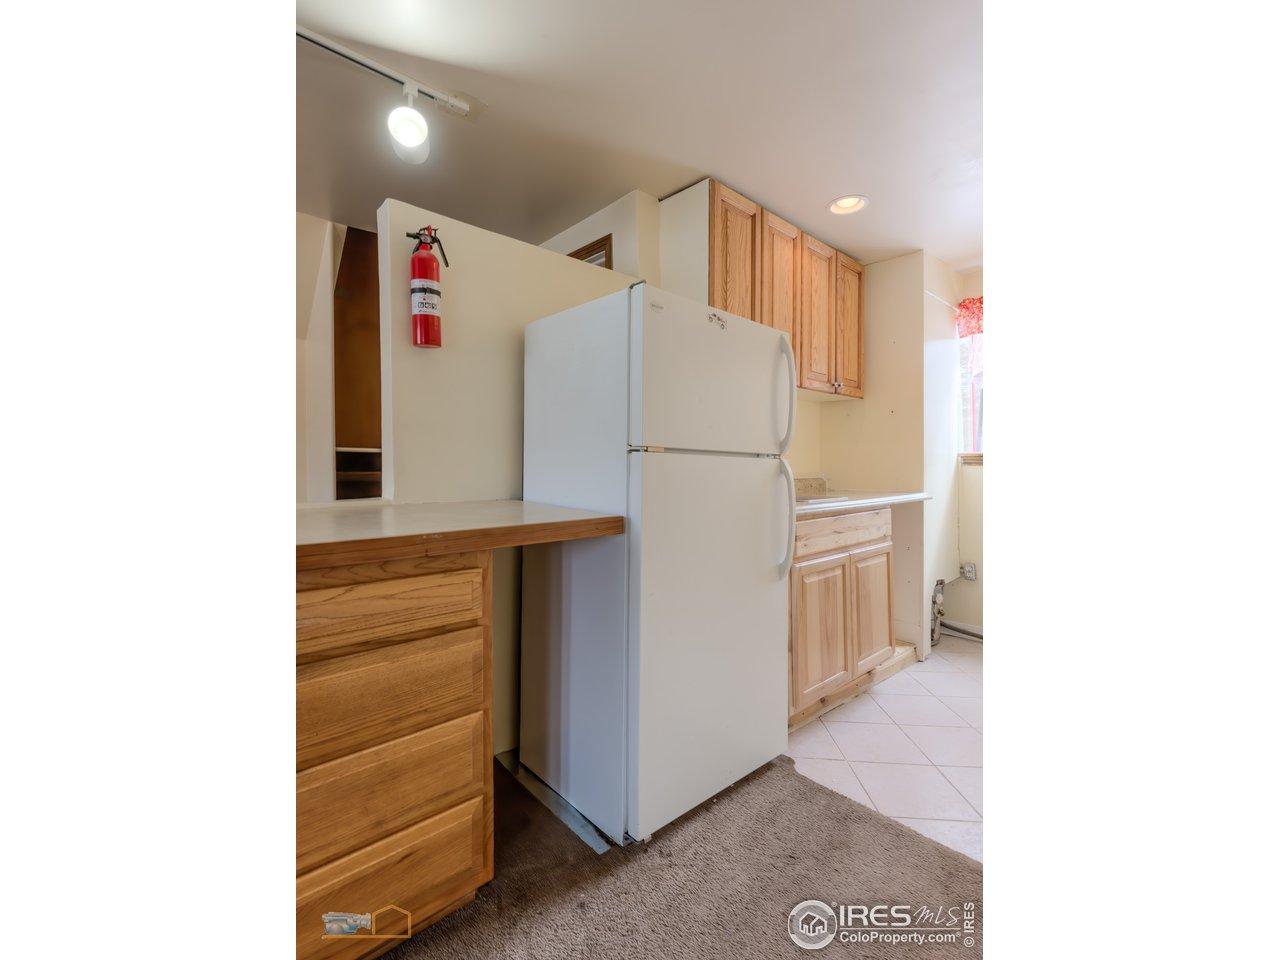 Lower level kitchenette